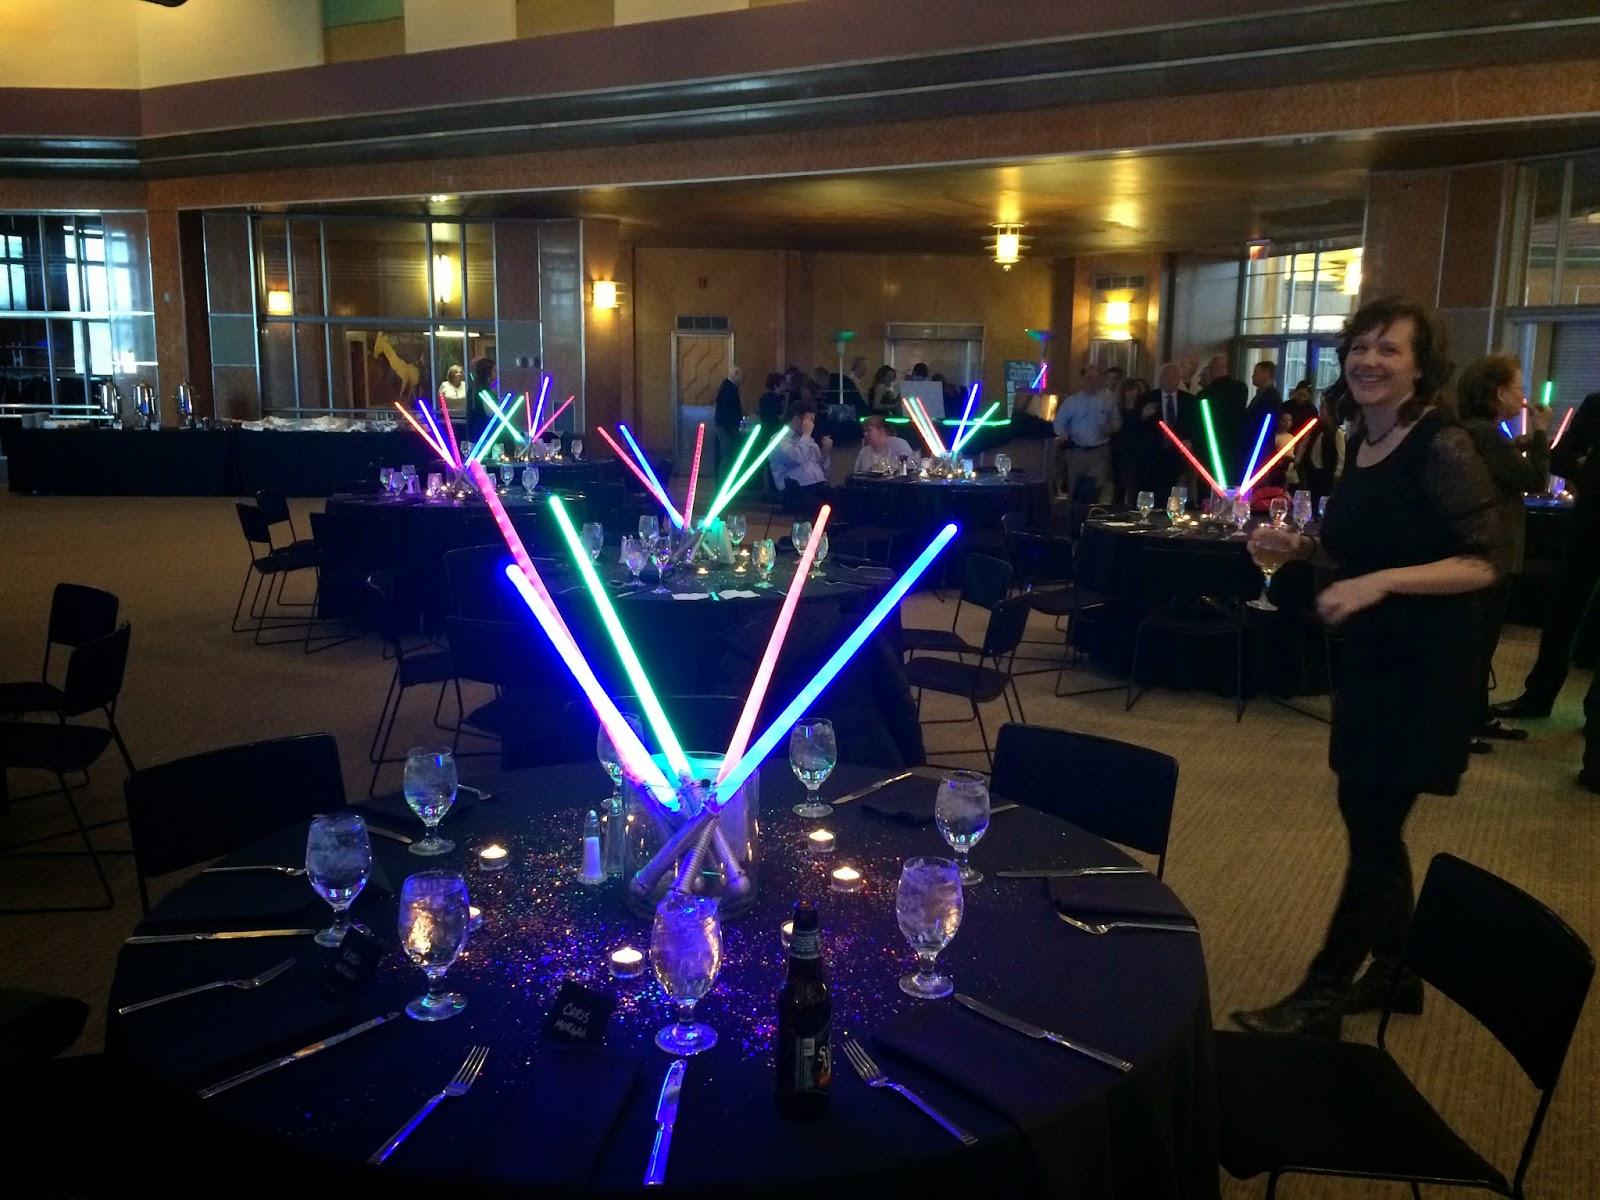 #241AB1 MargotMadison: Star Wars Themed Bar Mitzvah 5515 decorations de noel star wars 1600x1200 px @ aertt.com